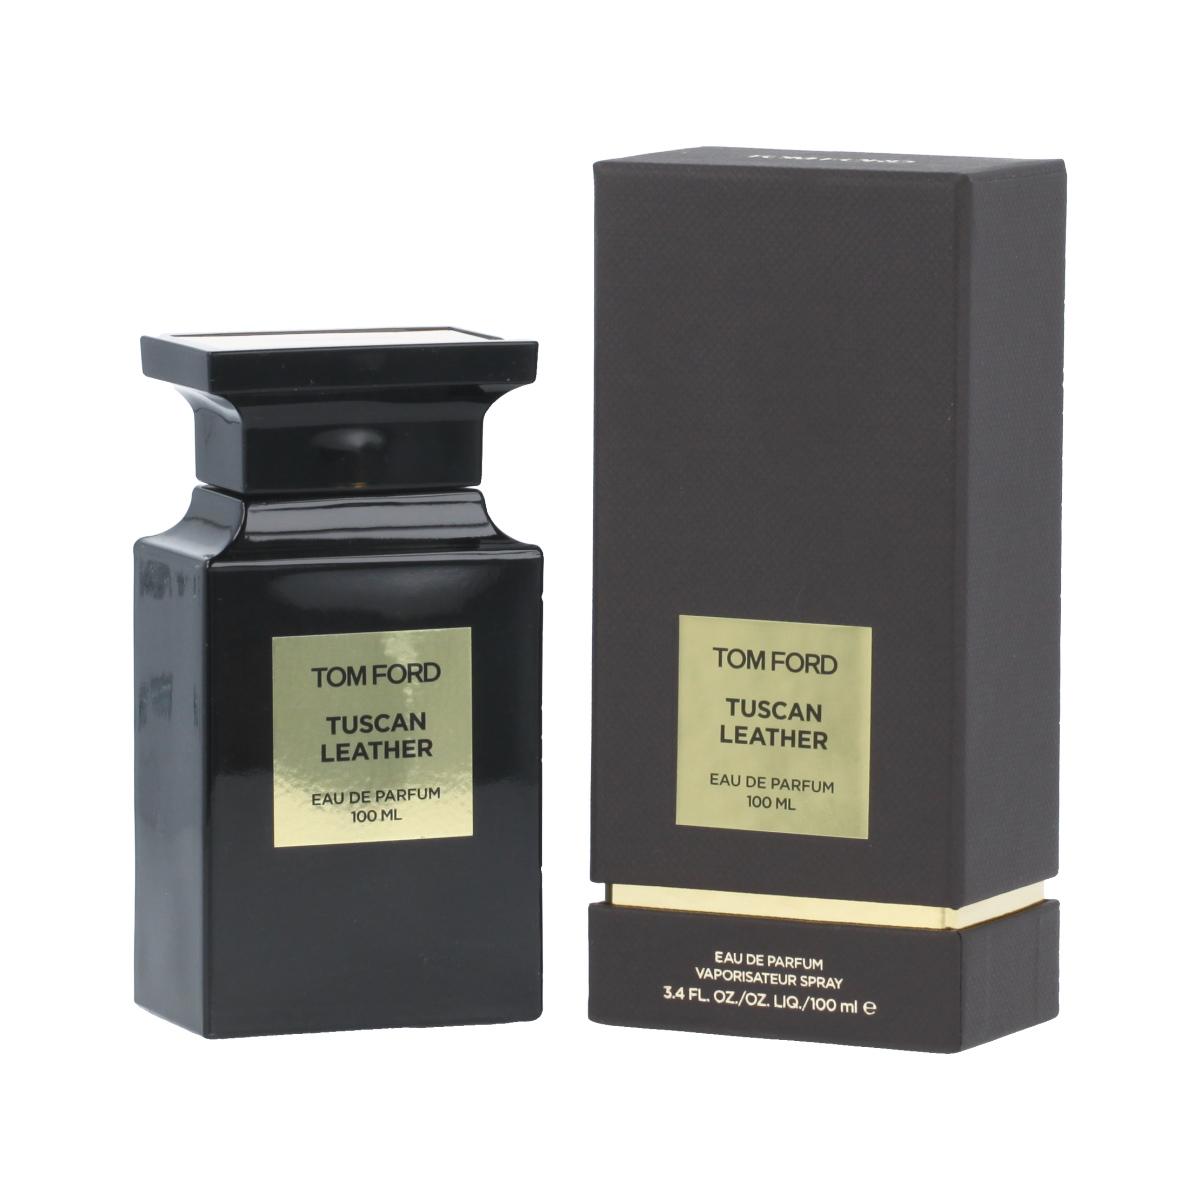 Tom Ford Tuscan Leather Eau De Parfum 100 ml (unisex) 95973